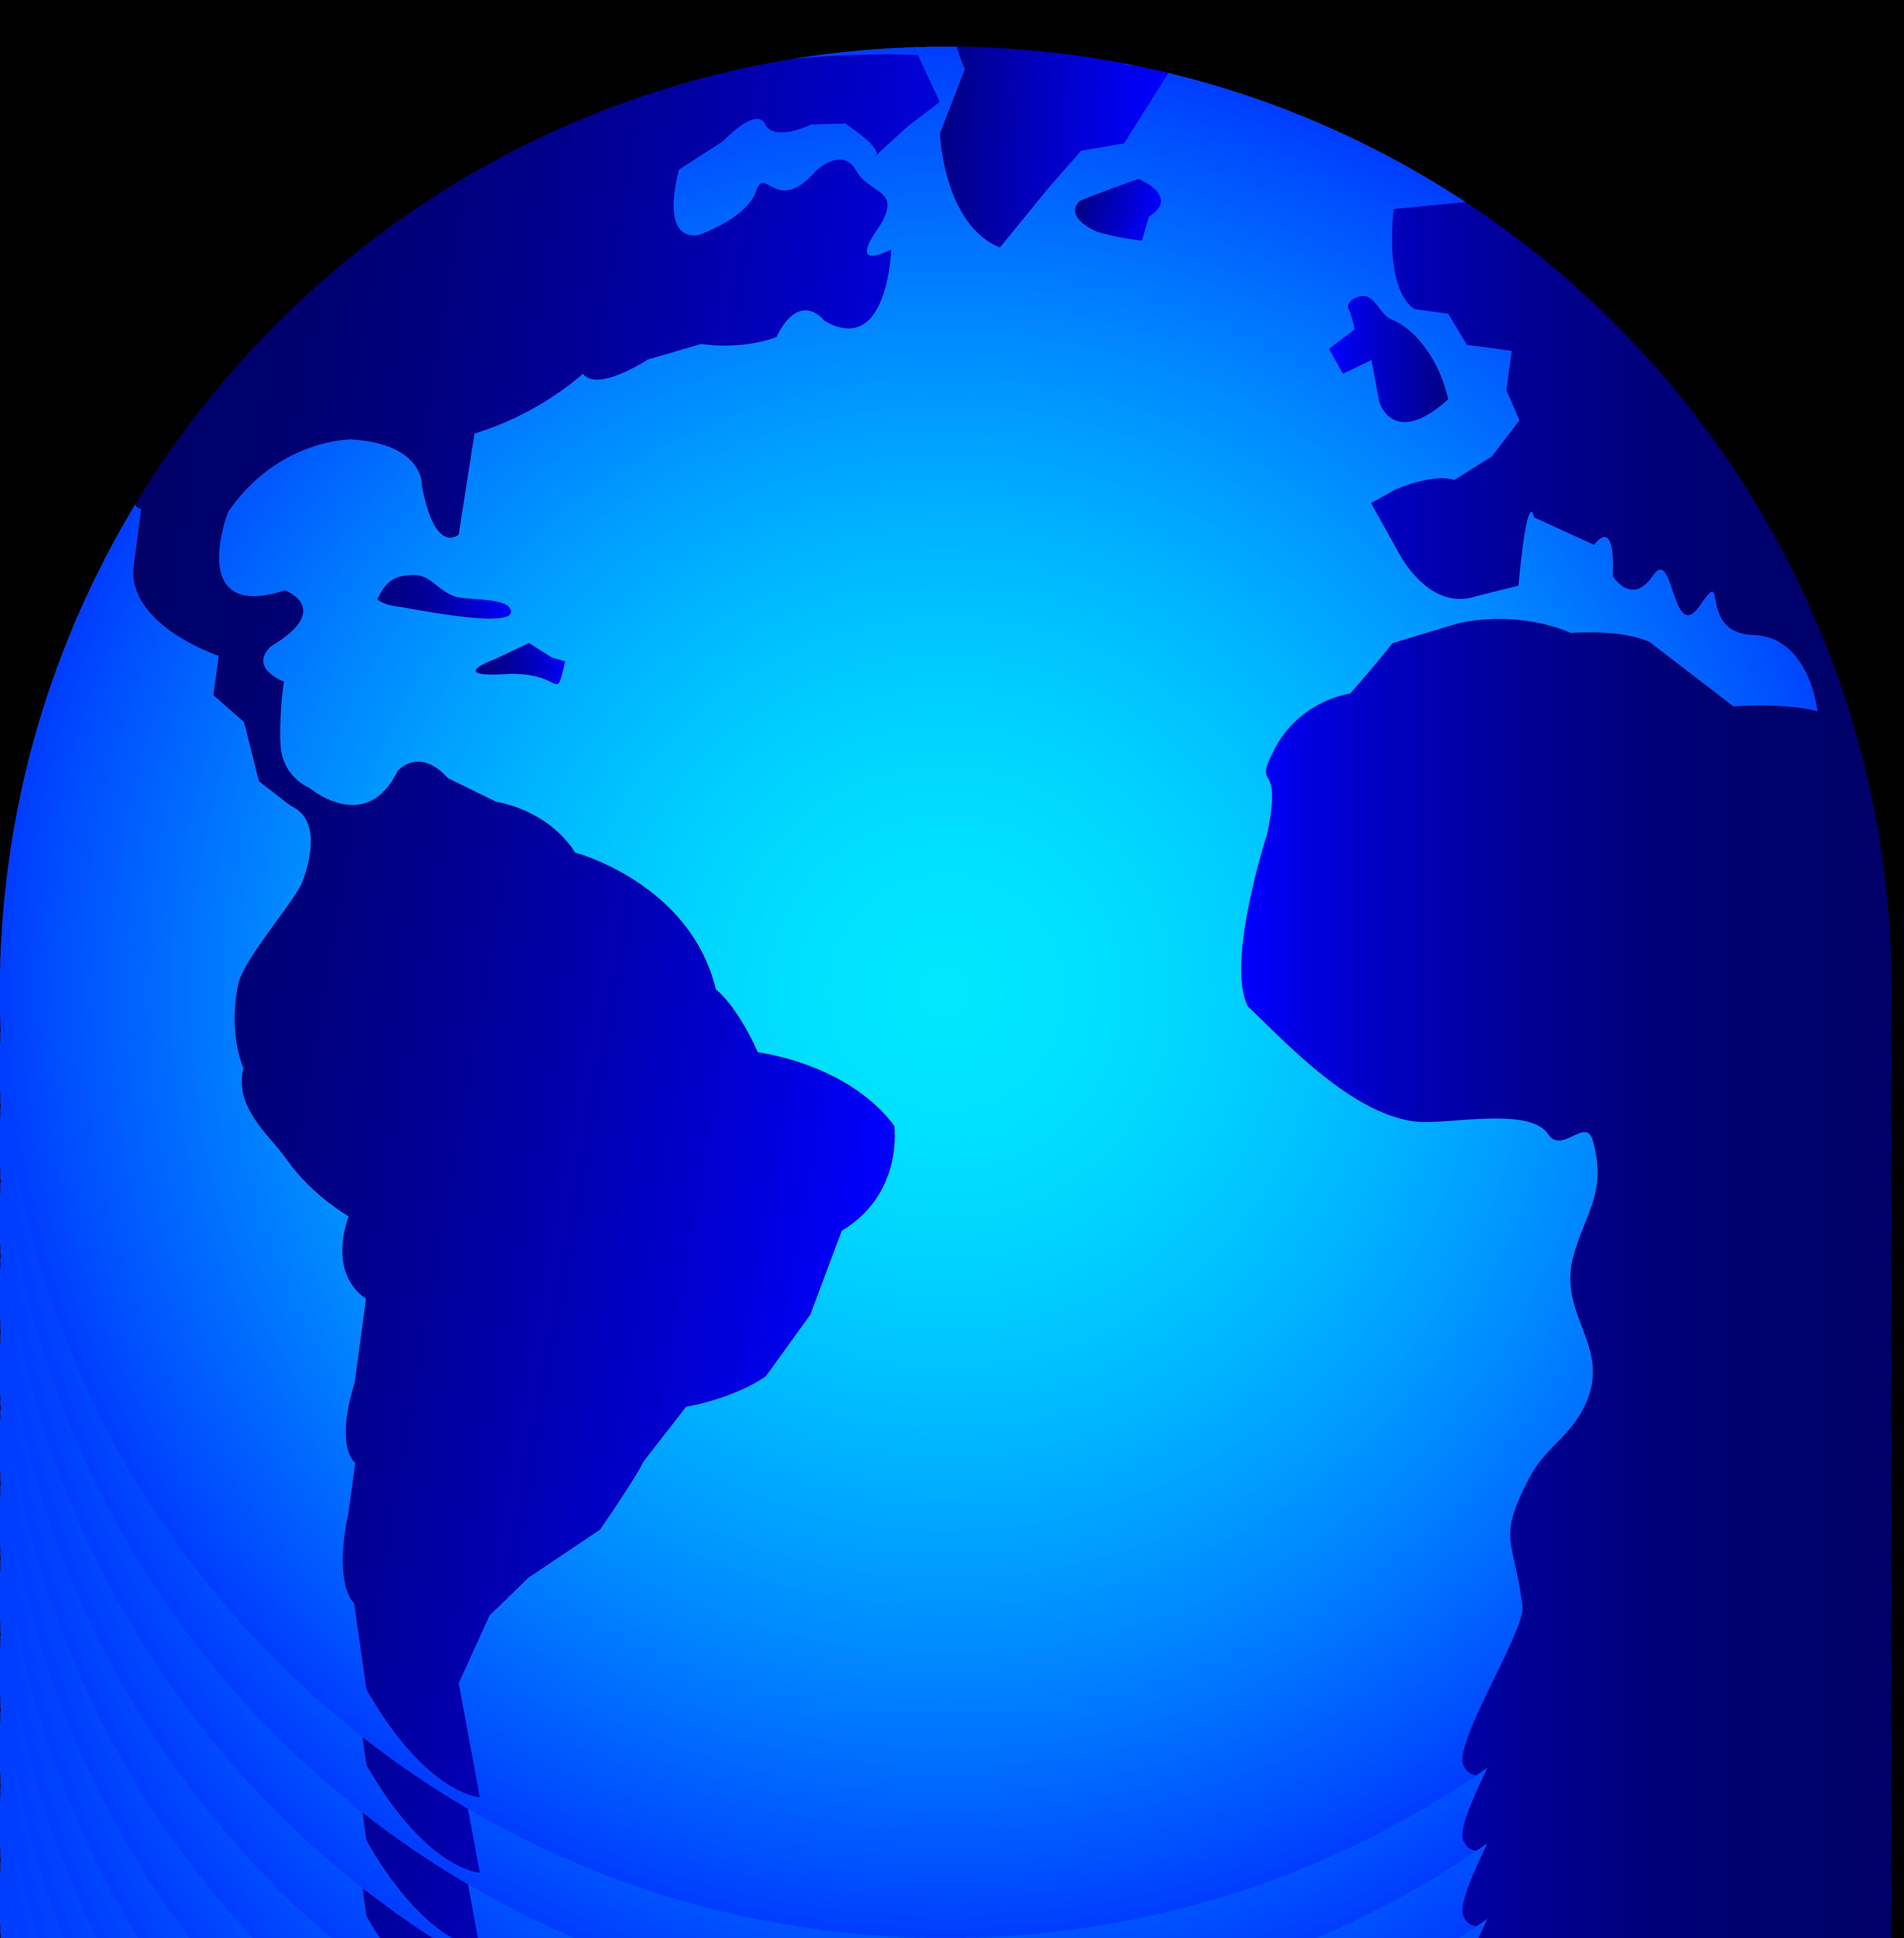 tone clipart u0026middot; globe clipart